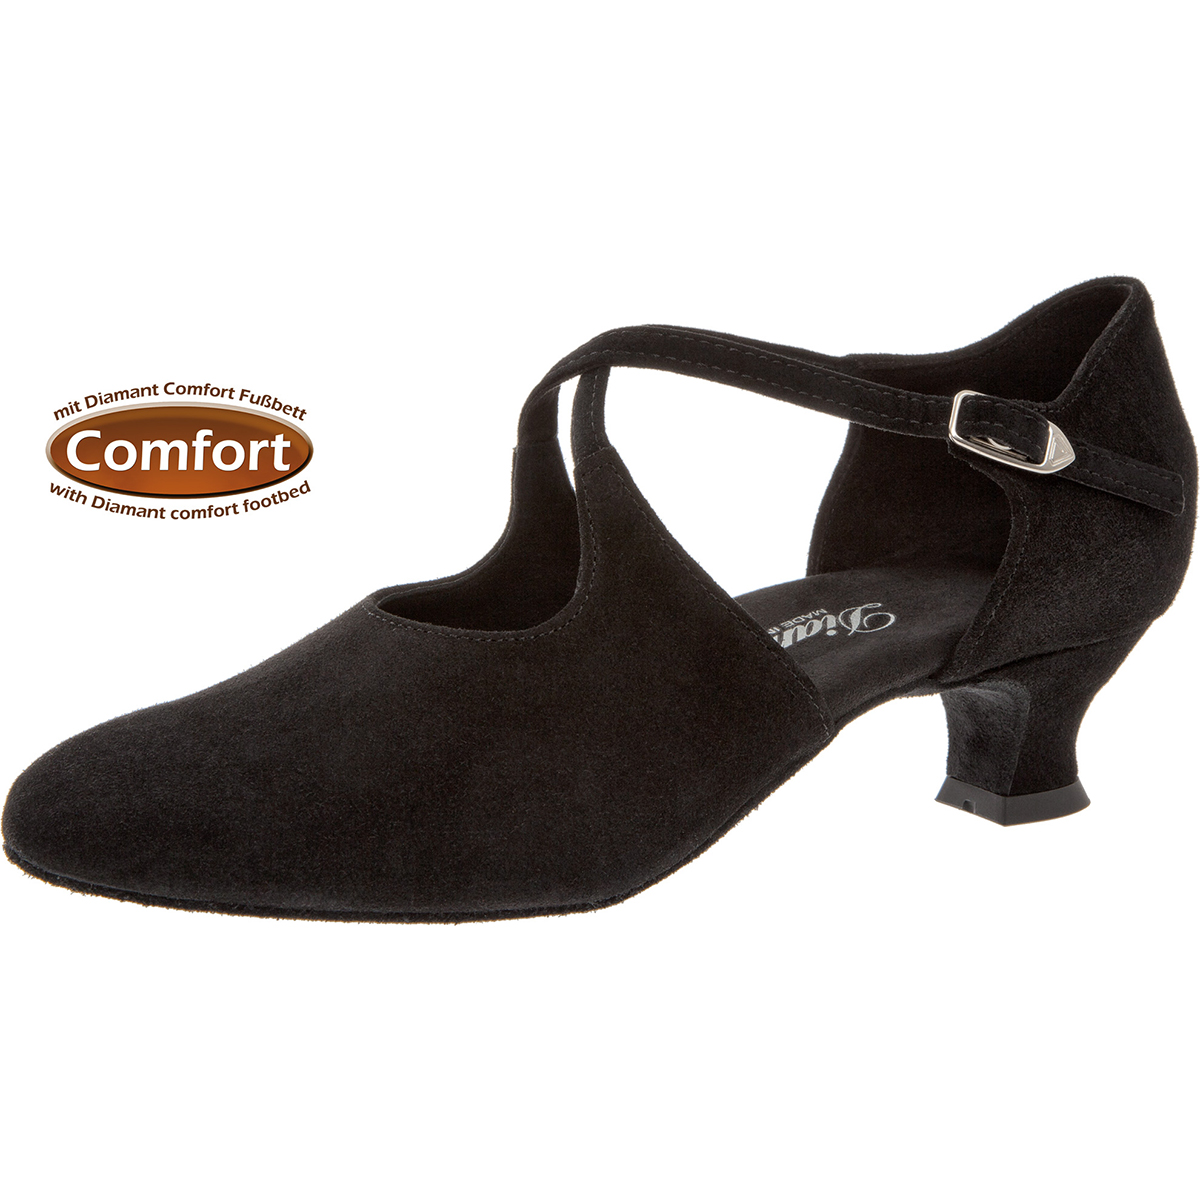 Diamant - Ladies Dance Shoes 052-112